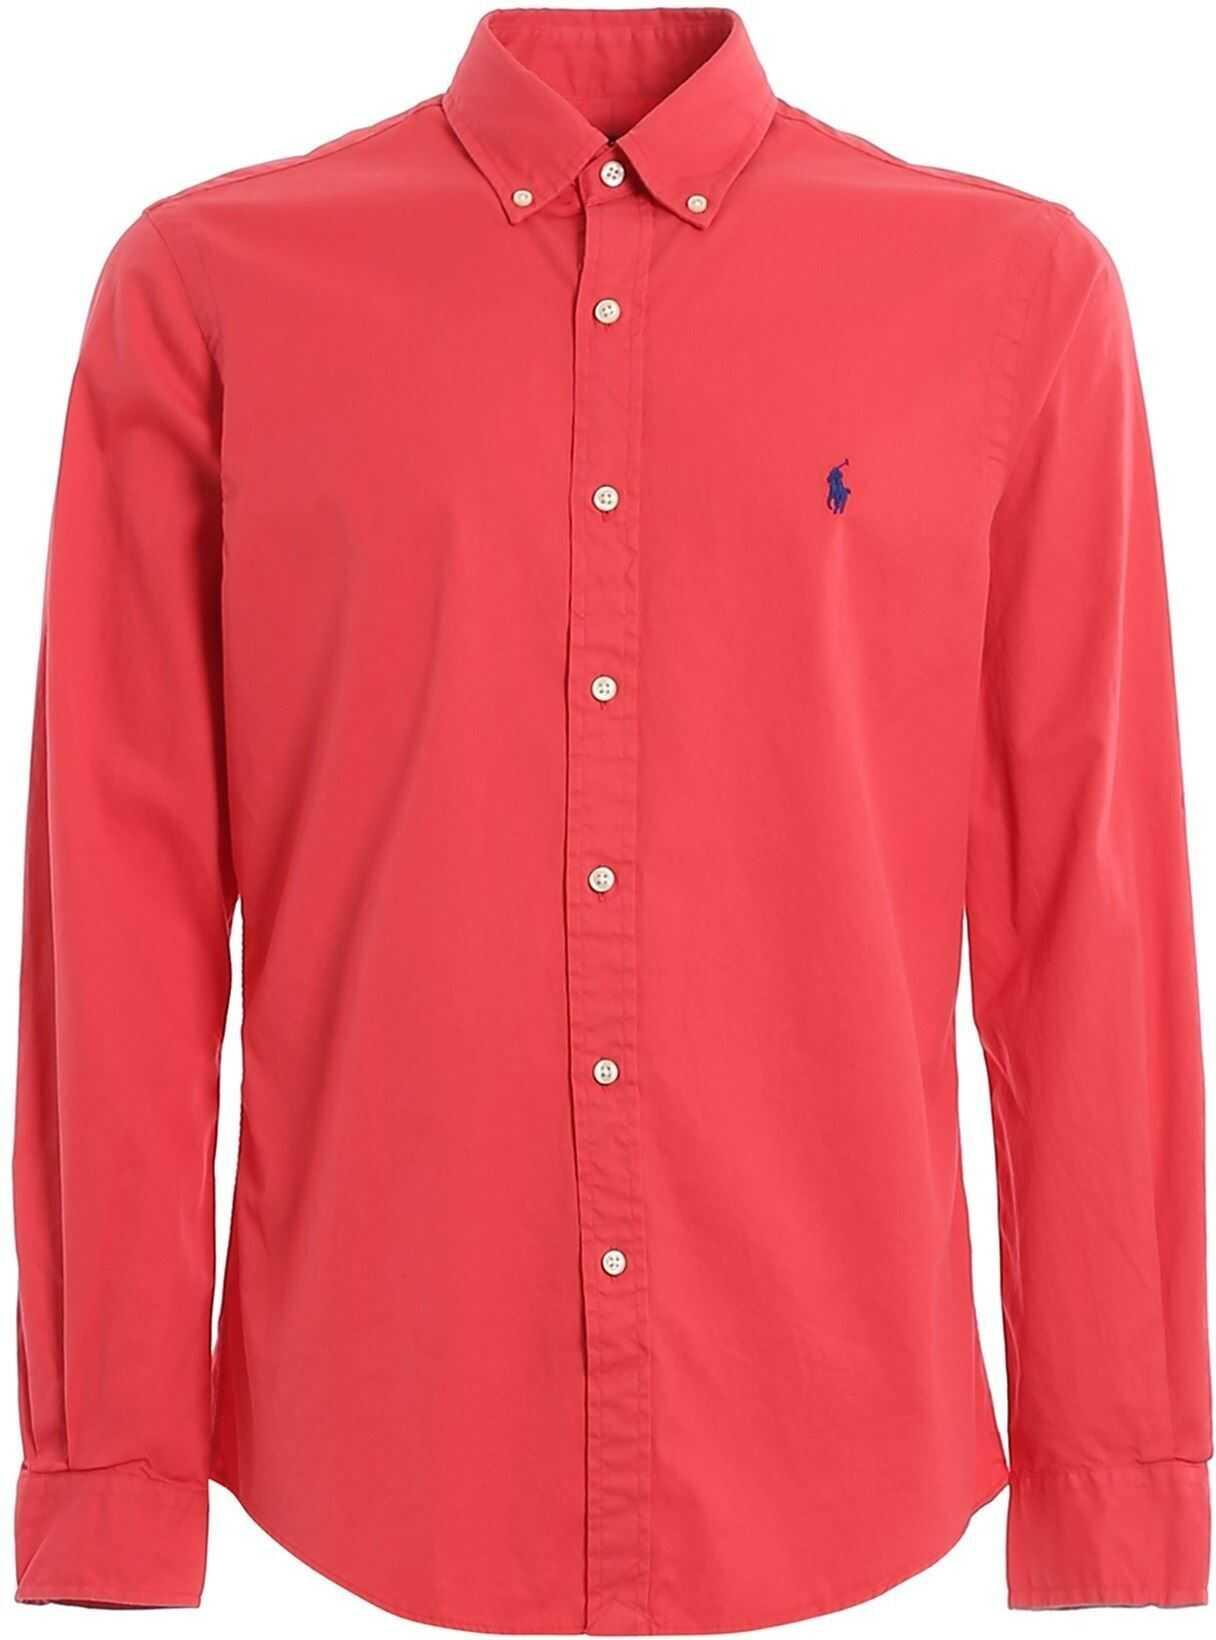 Ralph Lauren Logo Embroidery Cotton Shirt Red imagine